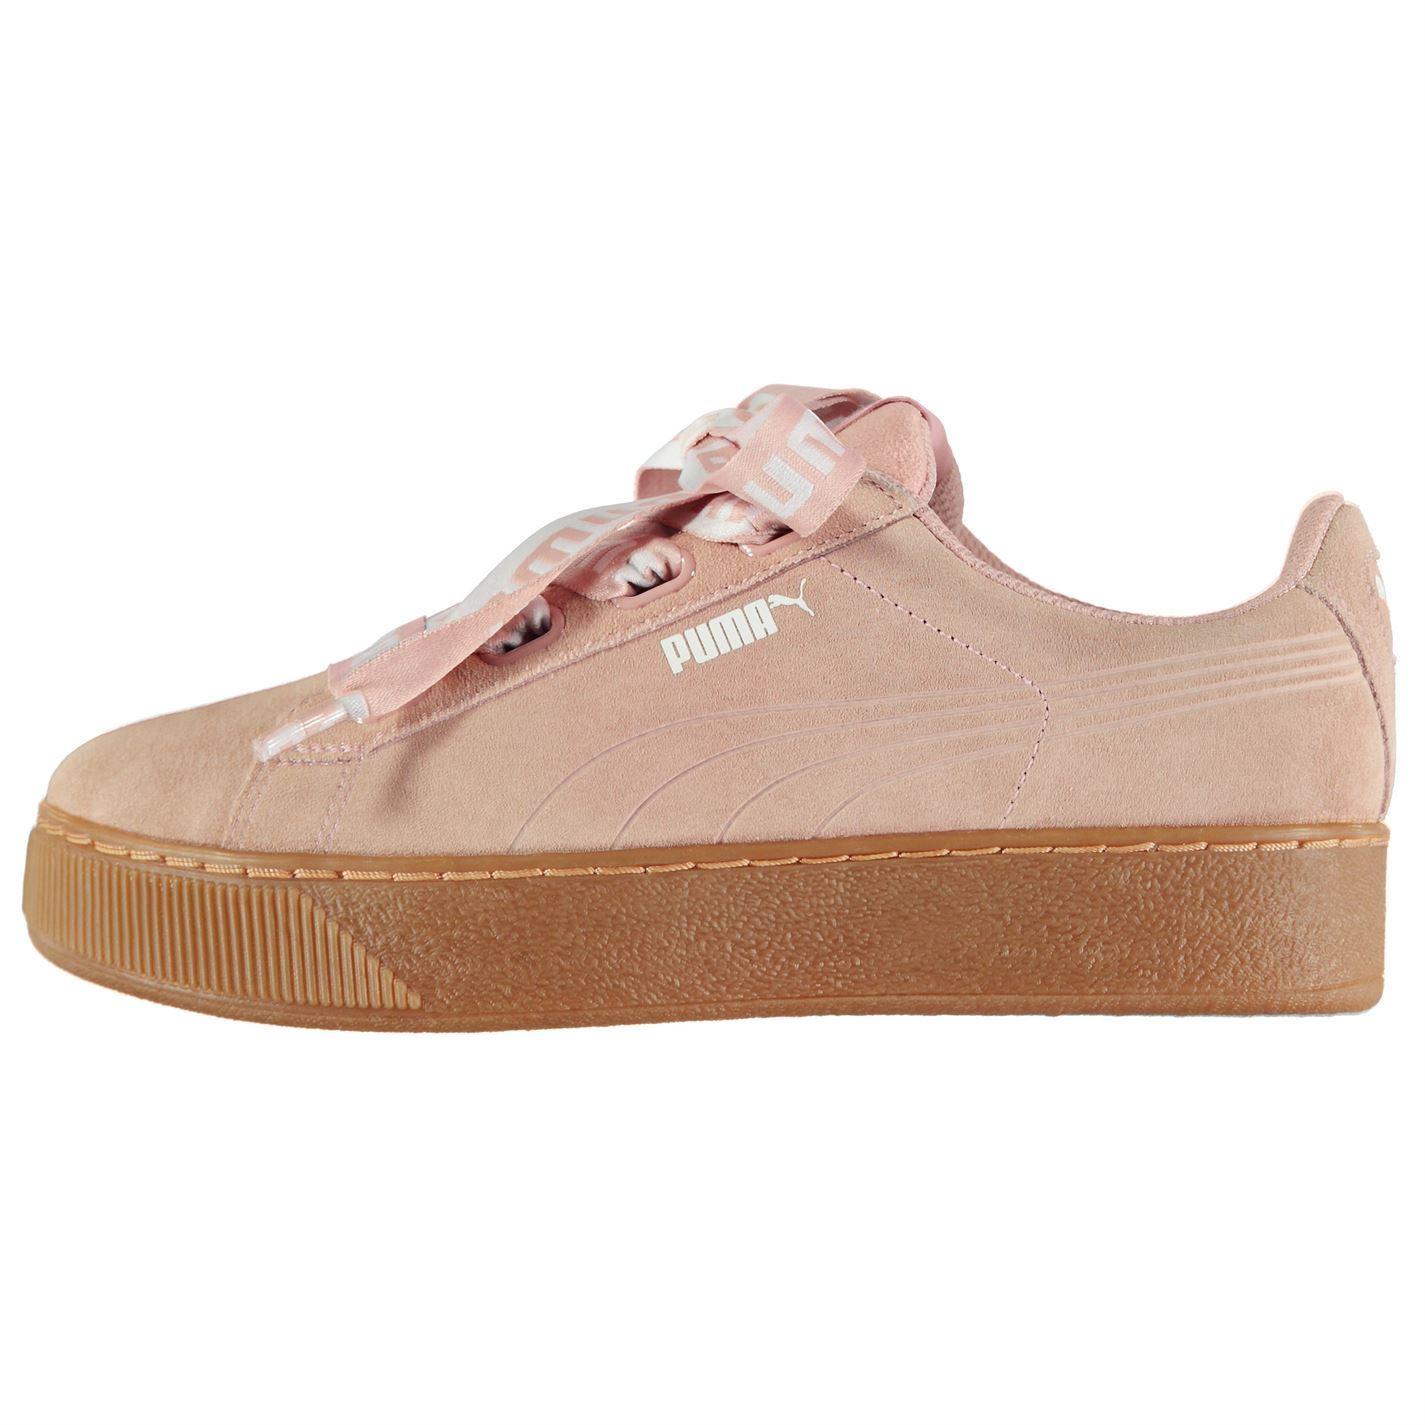 903dfc179996 ... Puma Vikky Platform Ribbon Trainers Womens Peach Sports Trainers  Sneakers ...